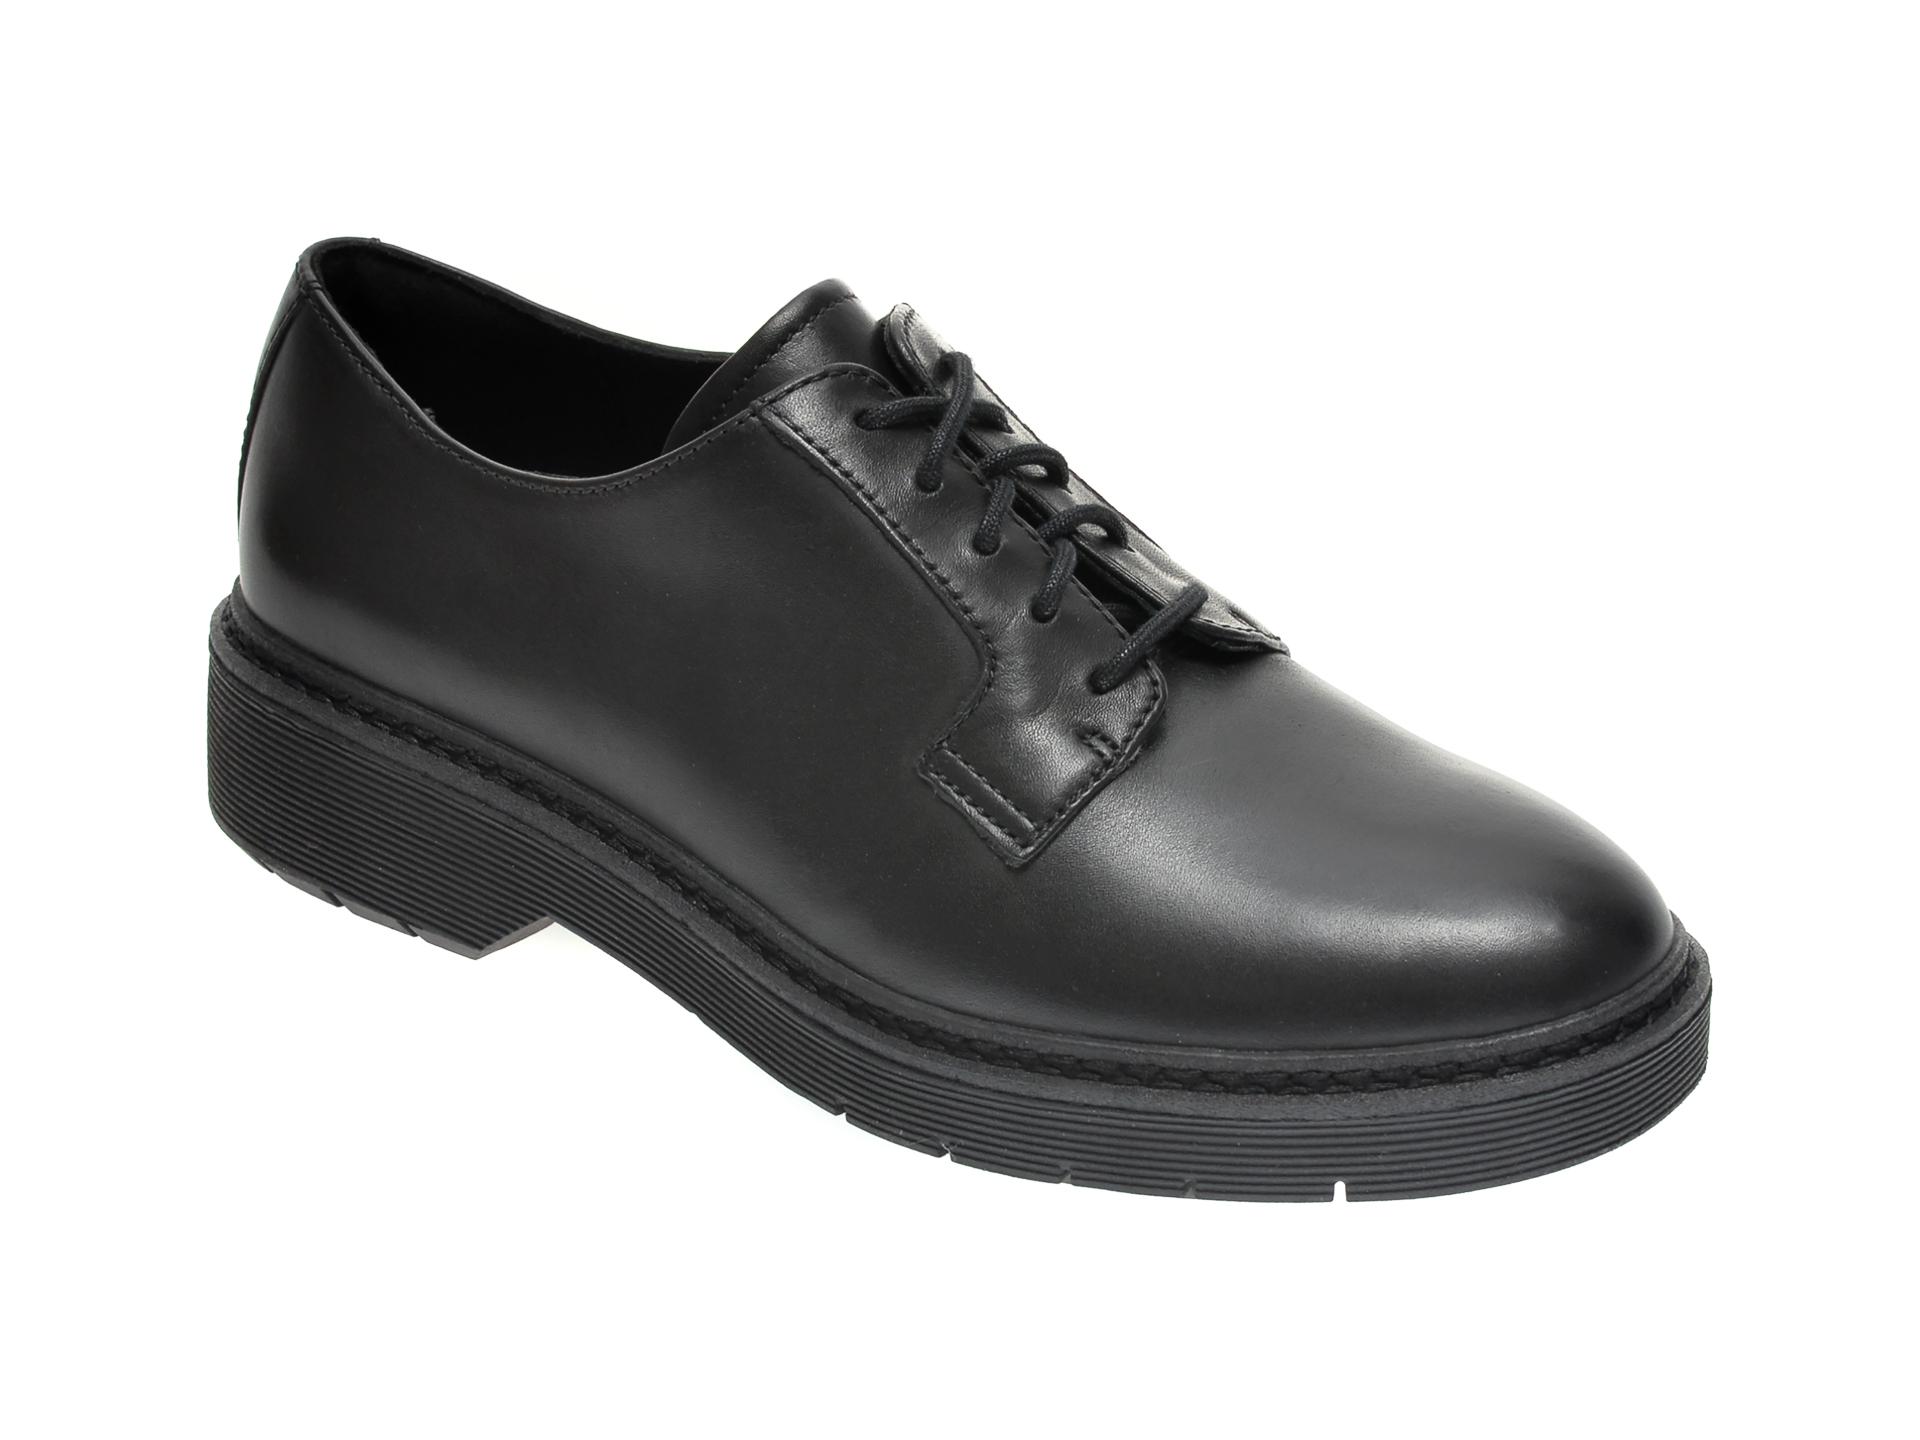 Pantofi CLARKS negri, WITCOMBE LACE, din piele naturala